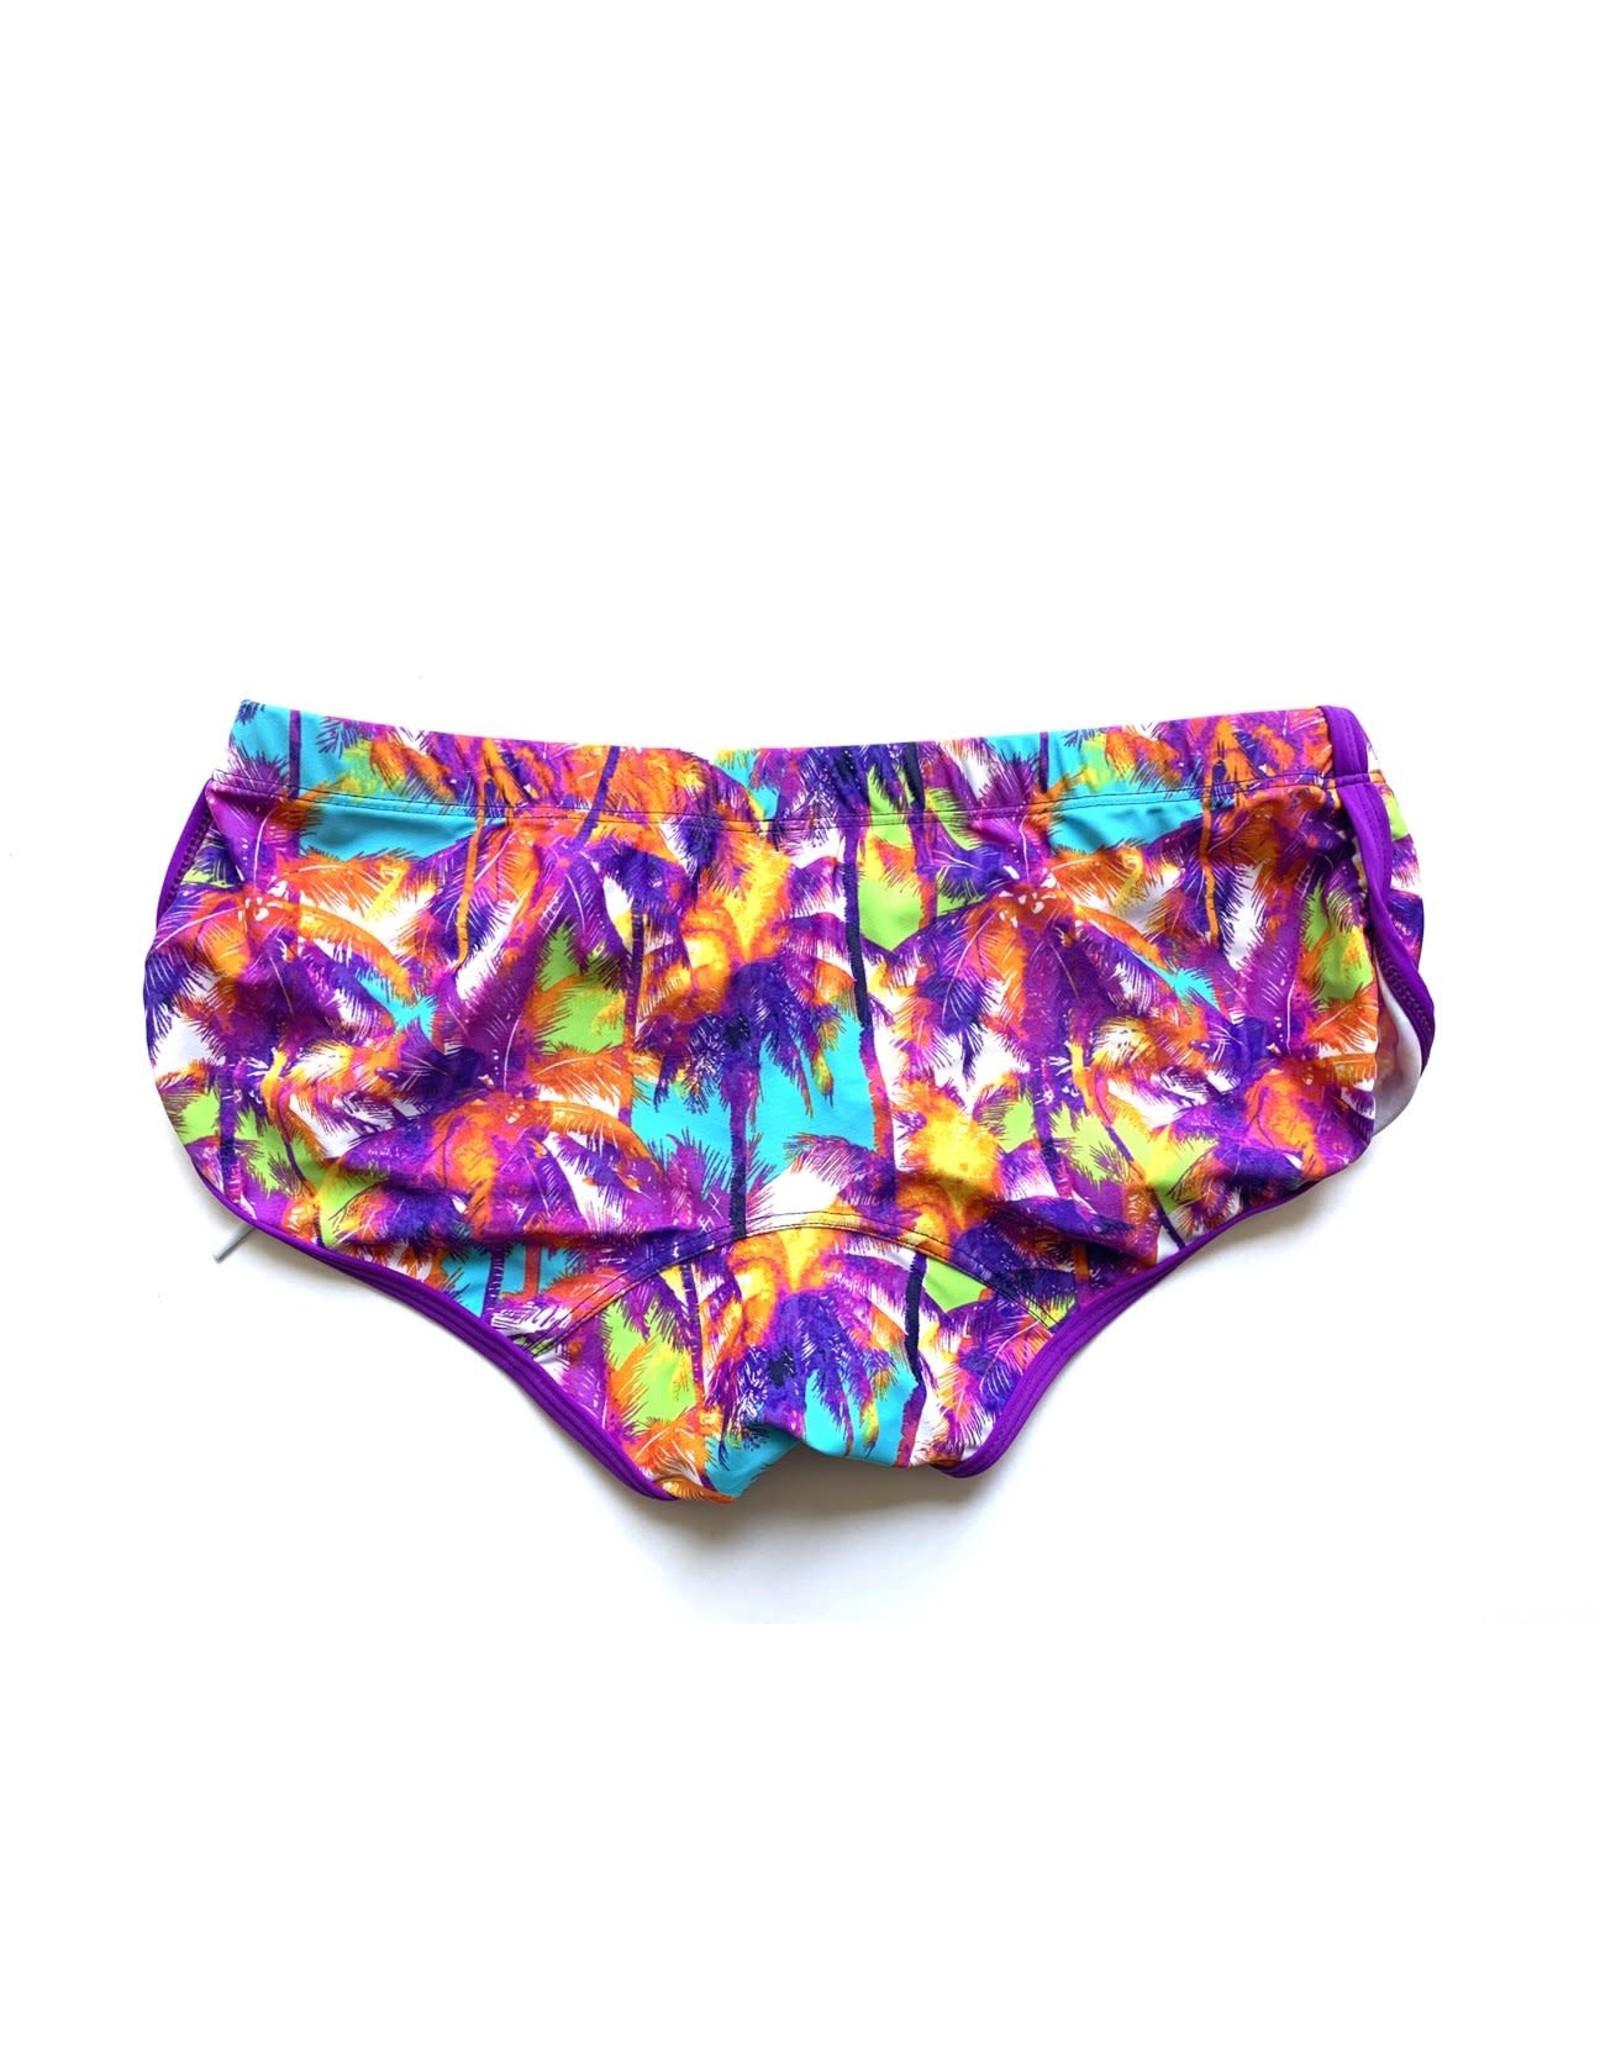 Vicedman Mini Shorts